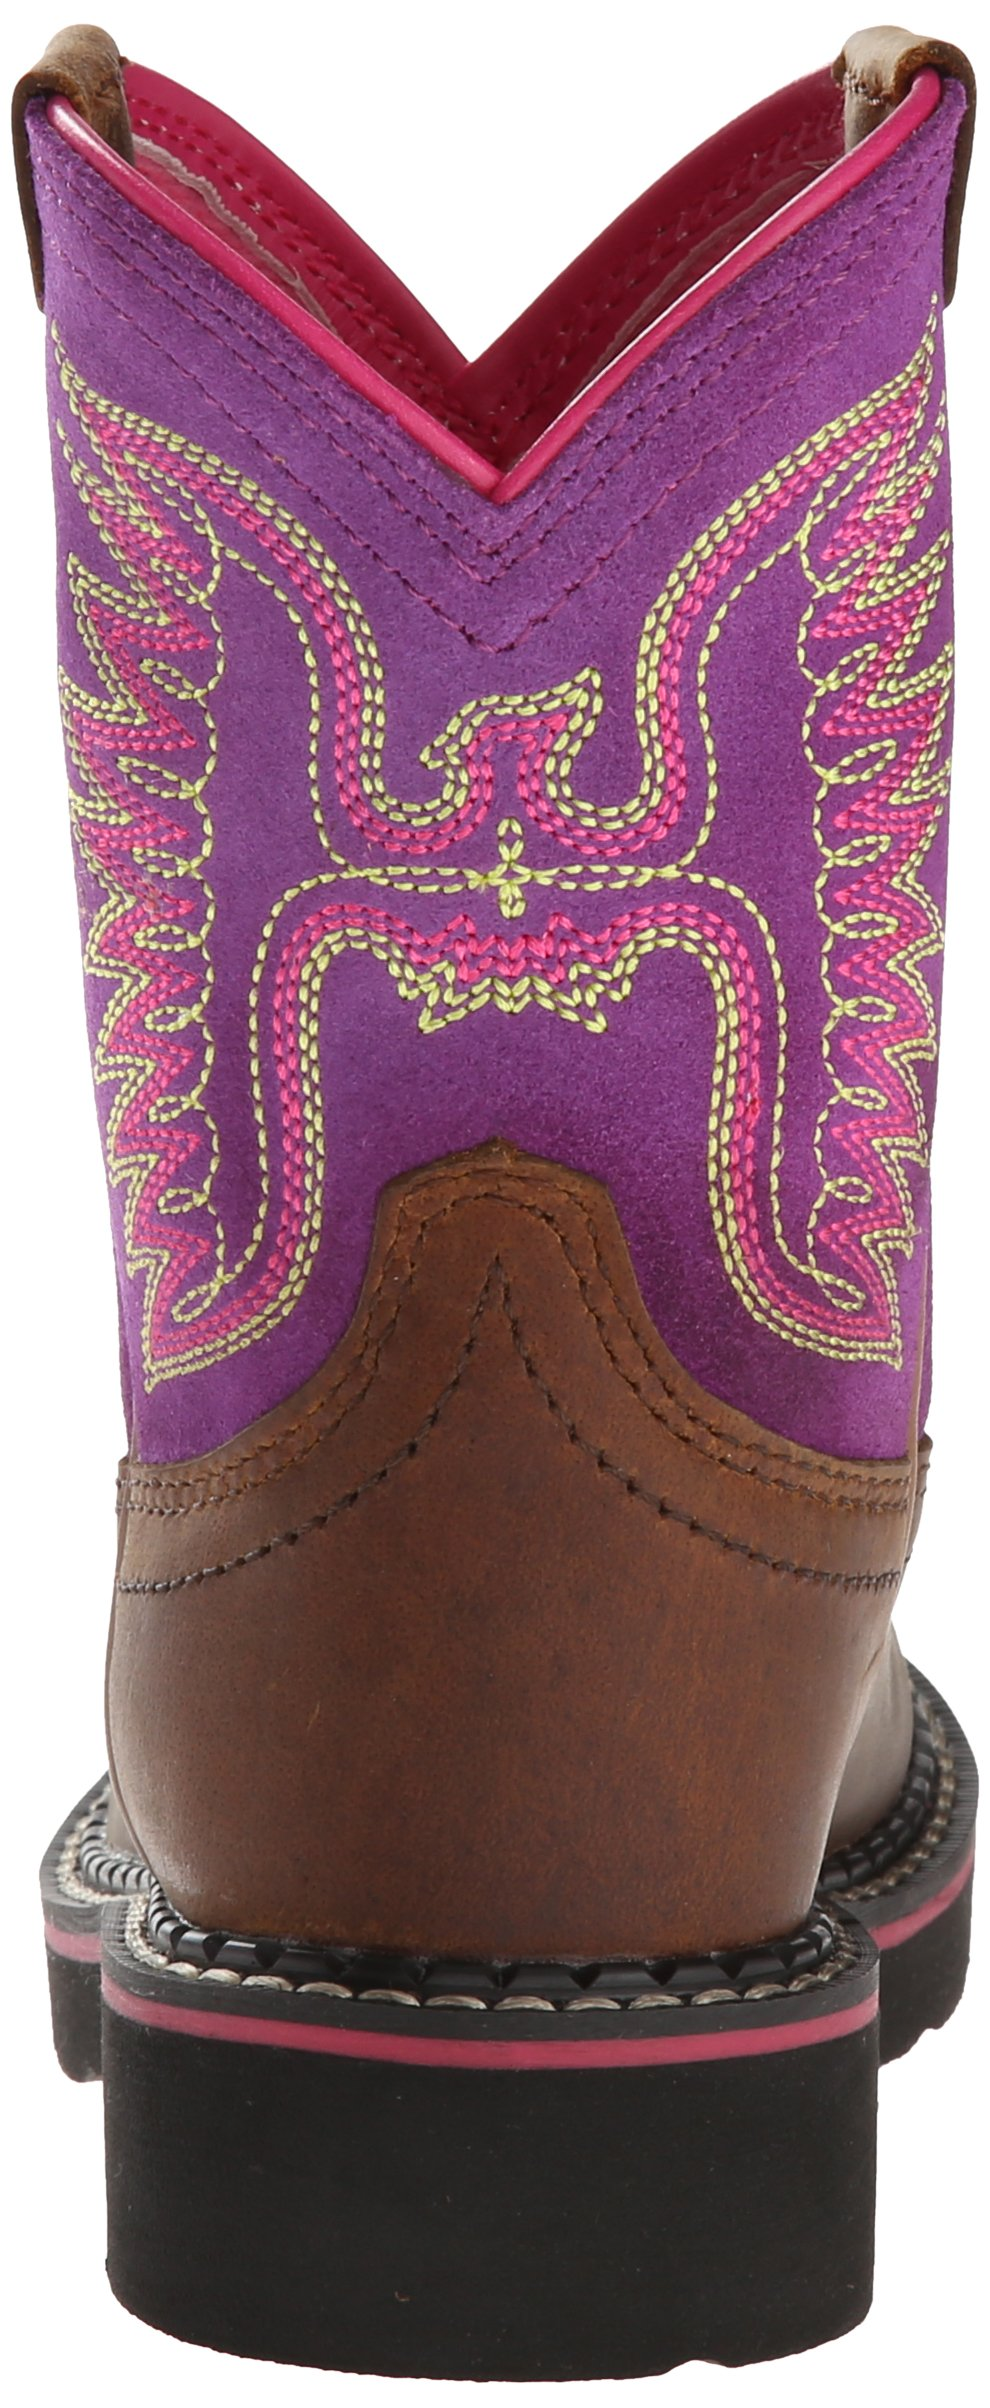 Kids' Fatbaby Thunderbird Western Cowboy Boot, Powder Brown/Amethyst, 12.5 M US Little Kid by ARIAT (Image #2)